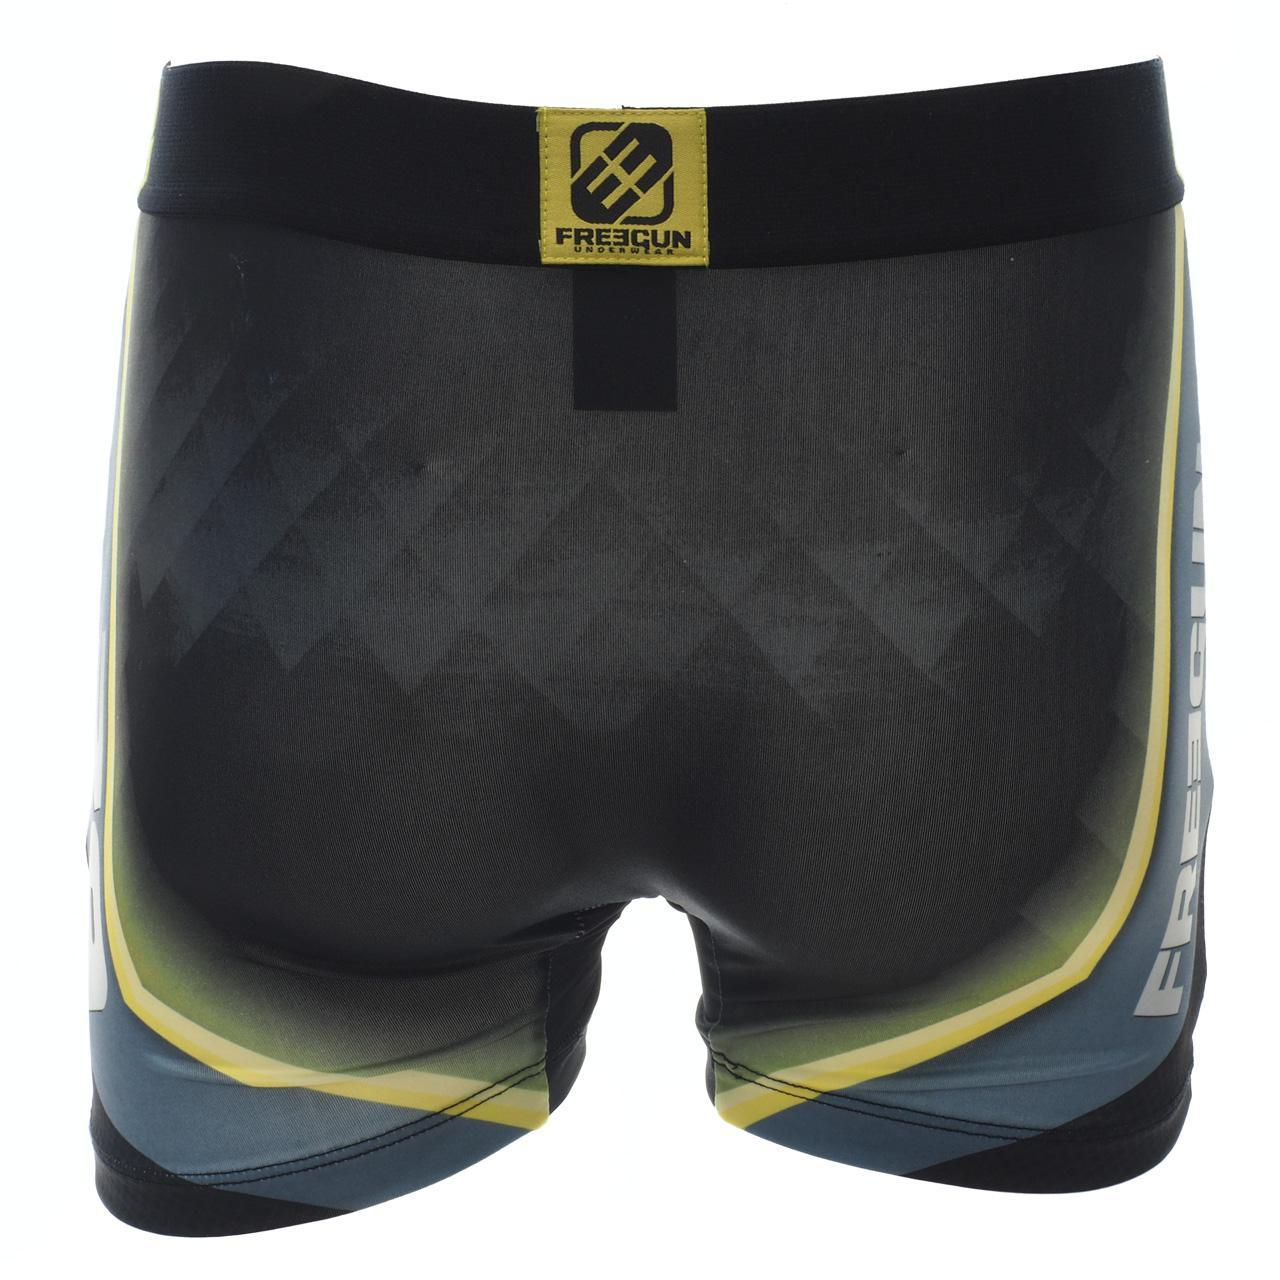 Underwear-Boxer-Freegun-Green-Black-Vrt-Black-Boxer-17919-New thumbnail 5